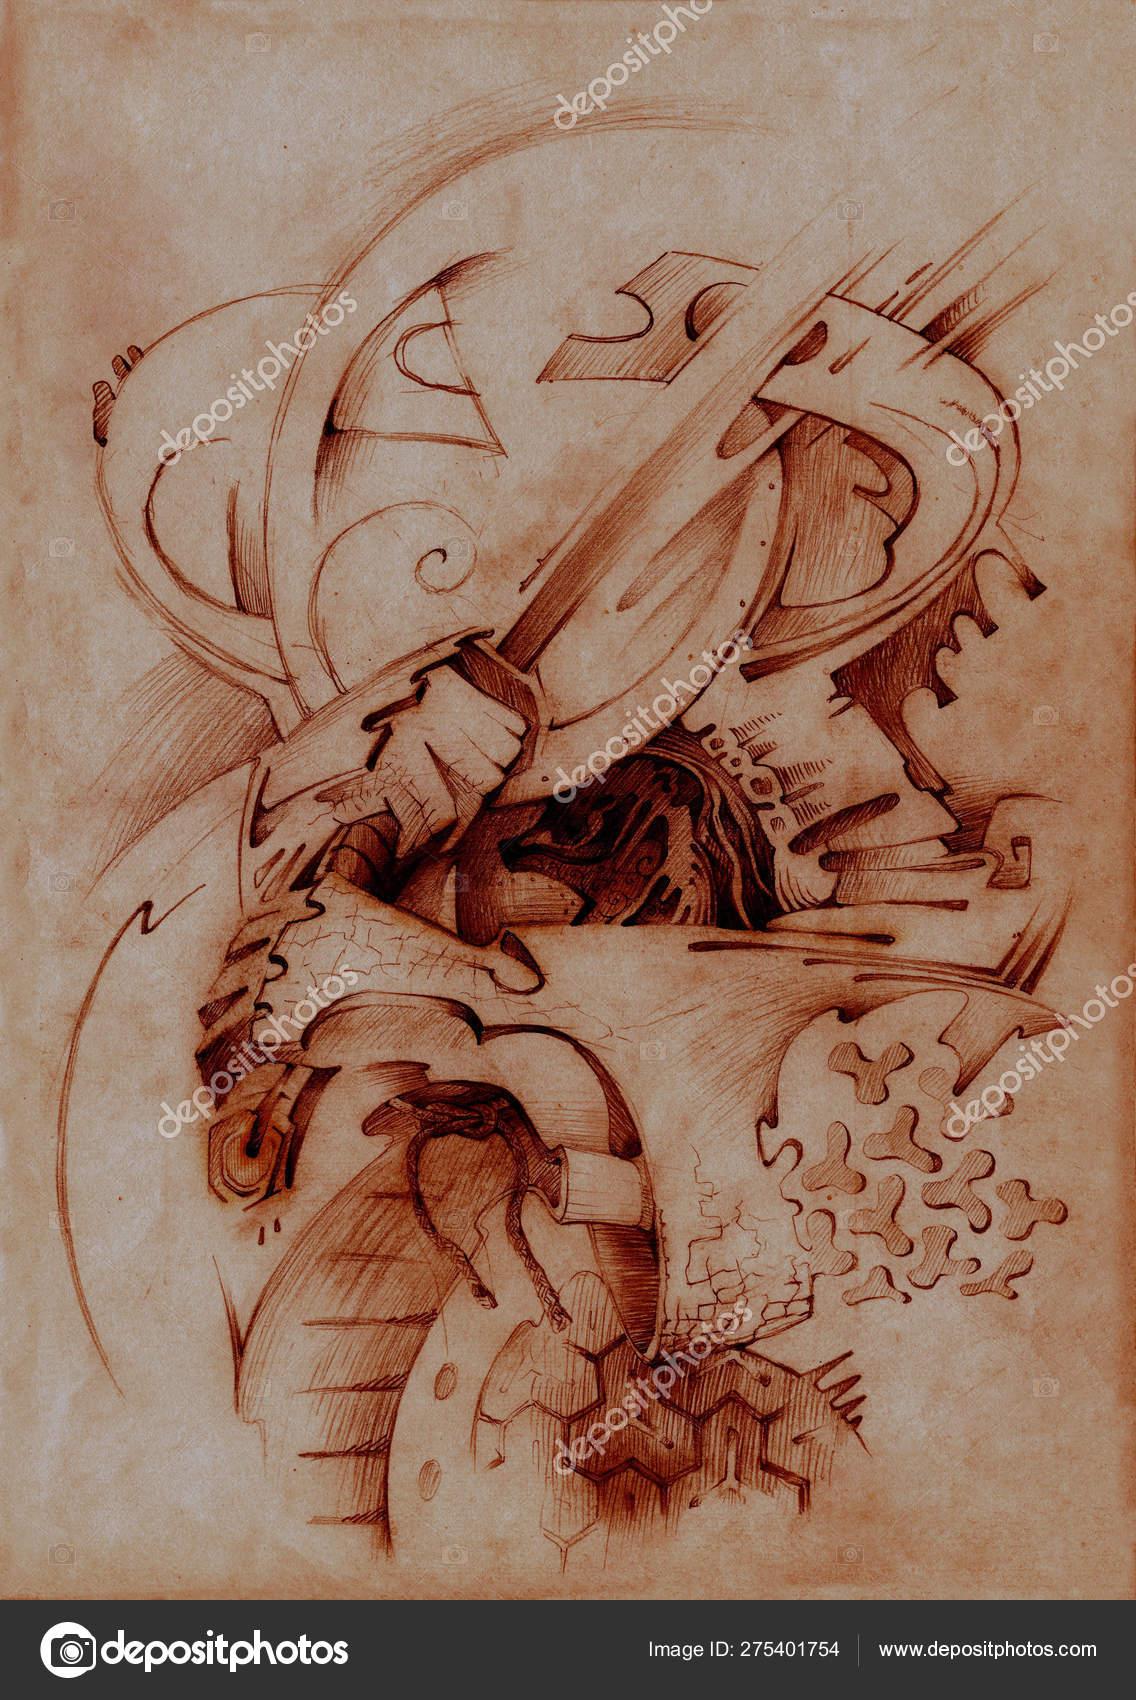 Illustration Samurai Graphics Made Paper Red Chalk Abstract Symbolic Art Stock Photo C Piterkrig 275401754